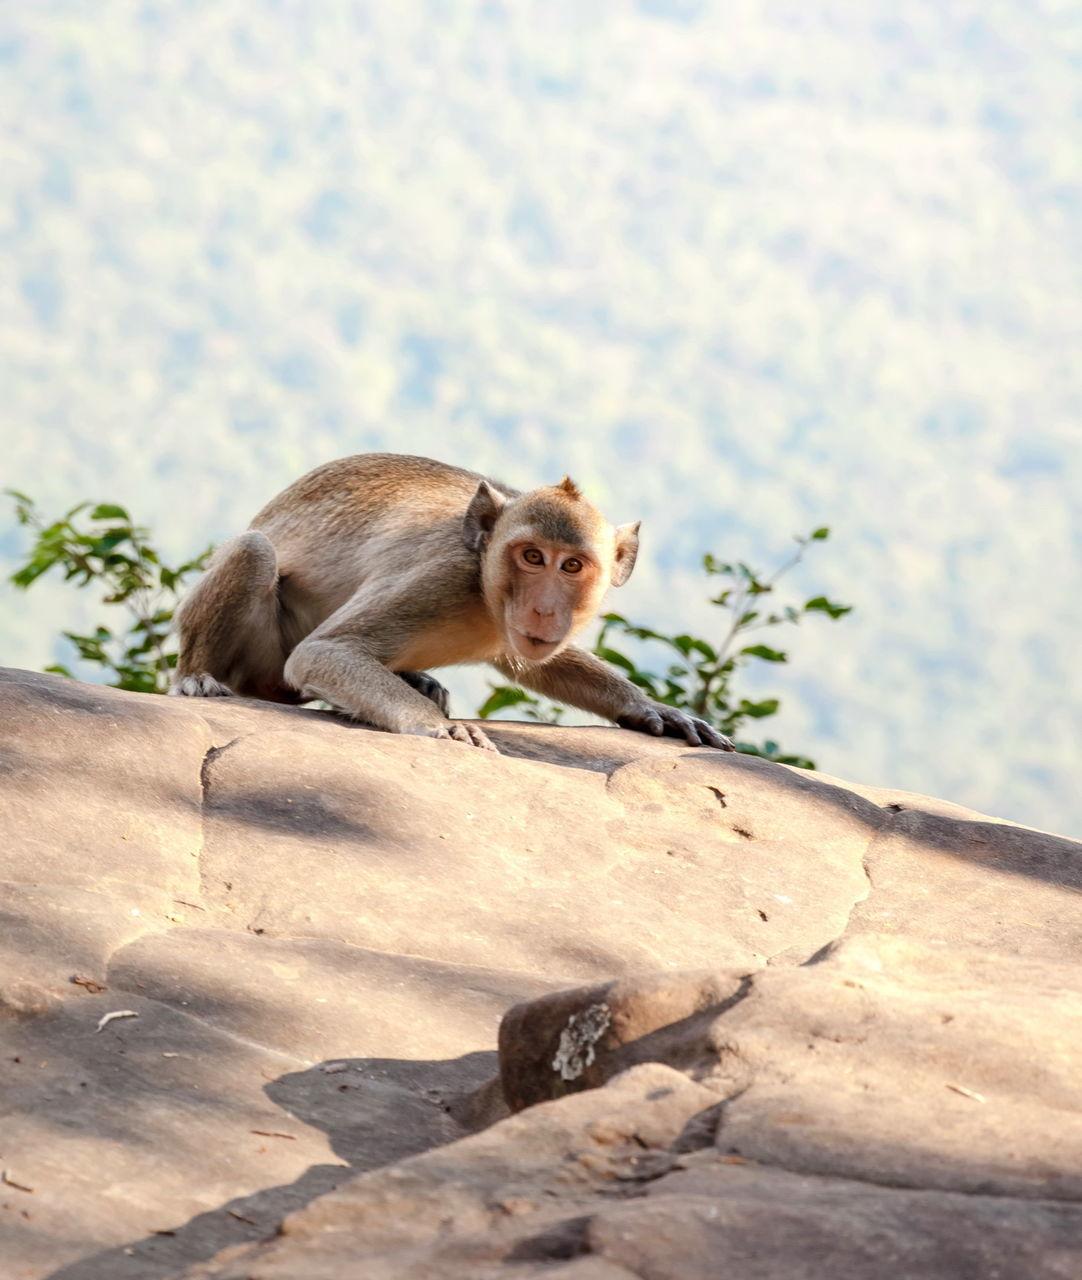 animal themes, one animal, mammal, animals in the wild, animal wildlife, sitting, no people, day, outdoors, nature, monkey, tree